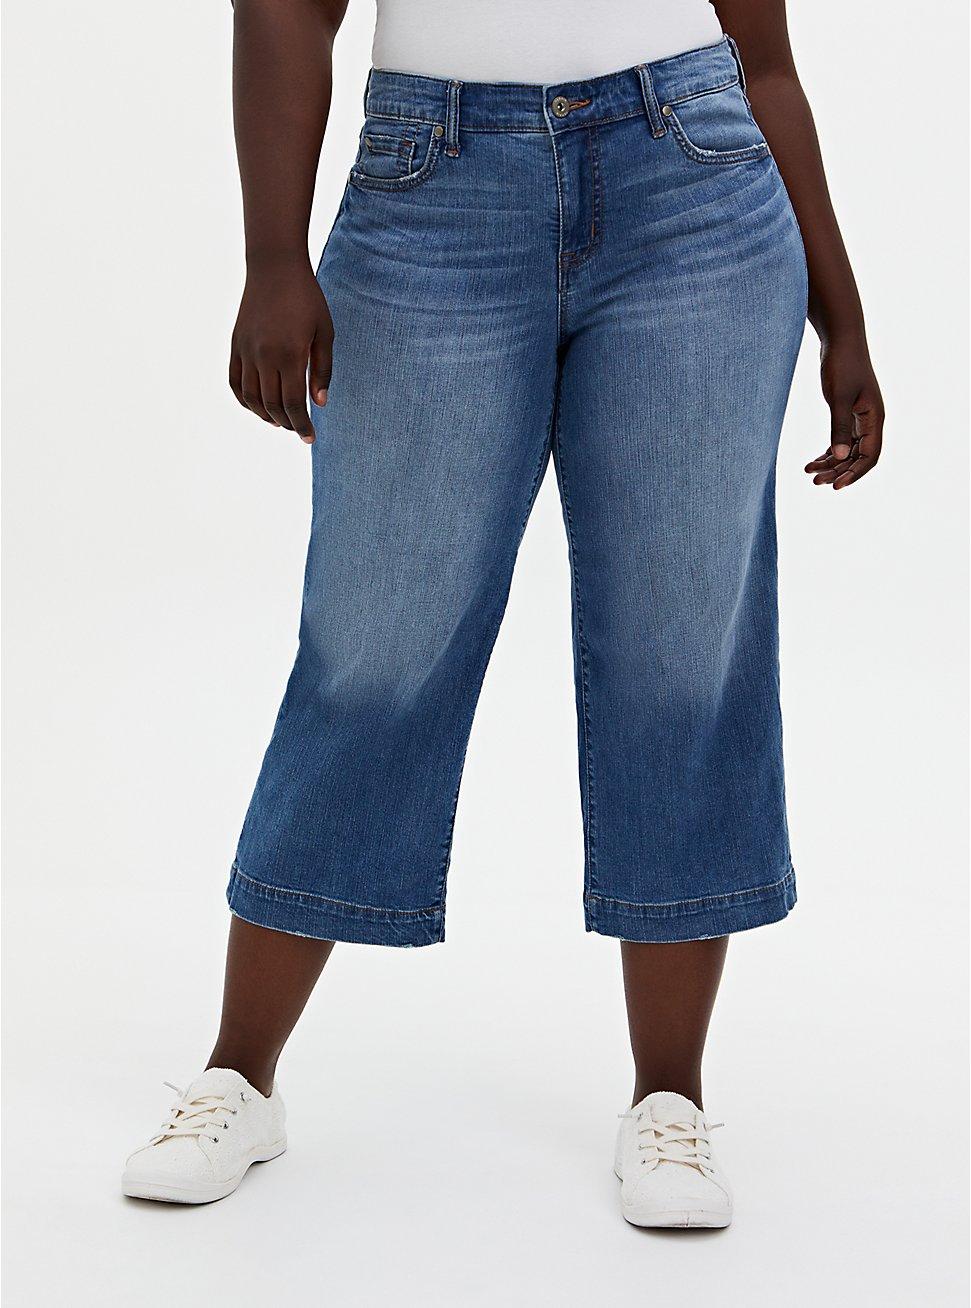 Crop High Rise Wide Leg Jean - Vintage Stretch Light Wash, , fitModel1-hires